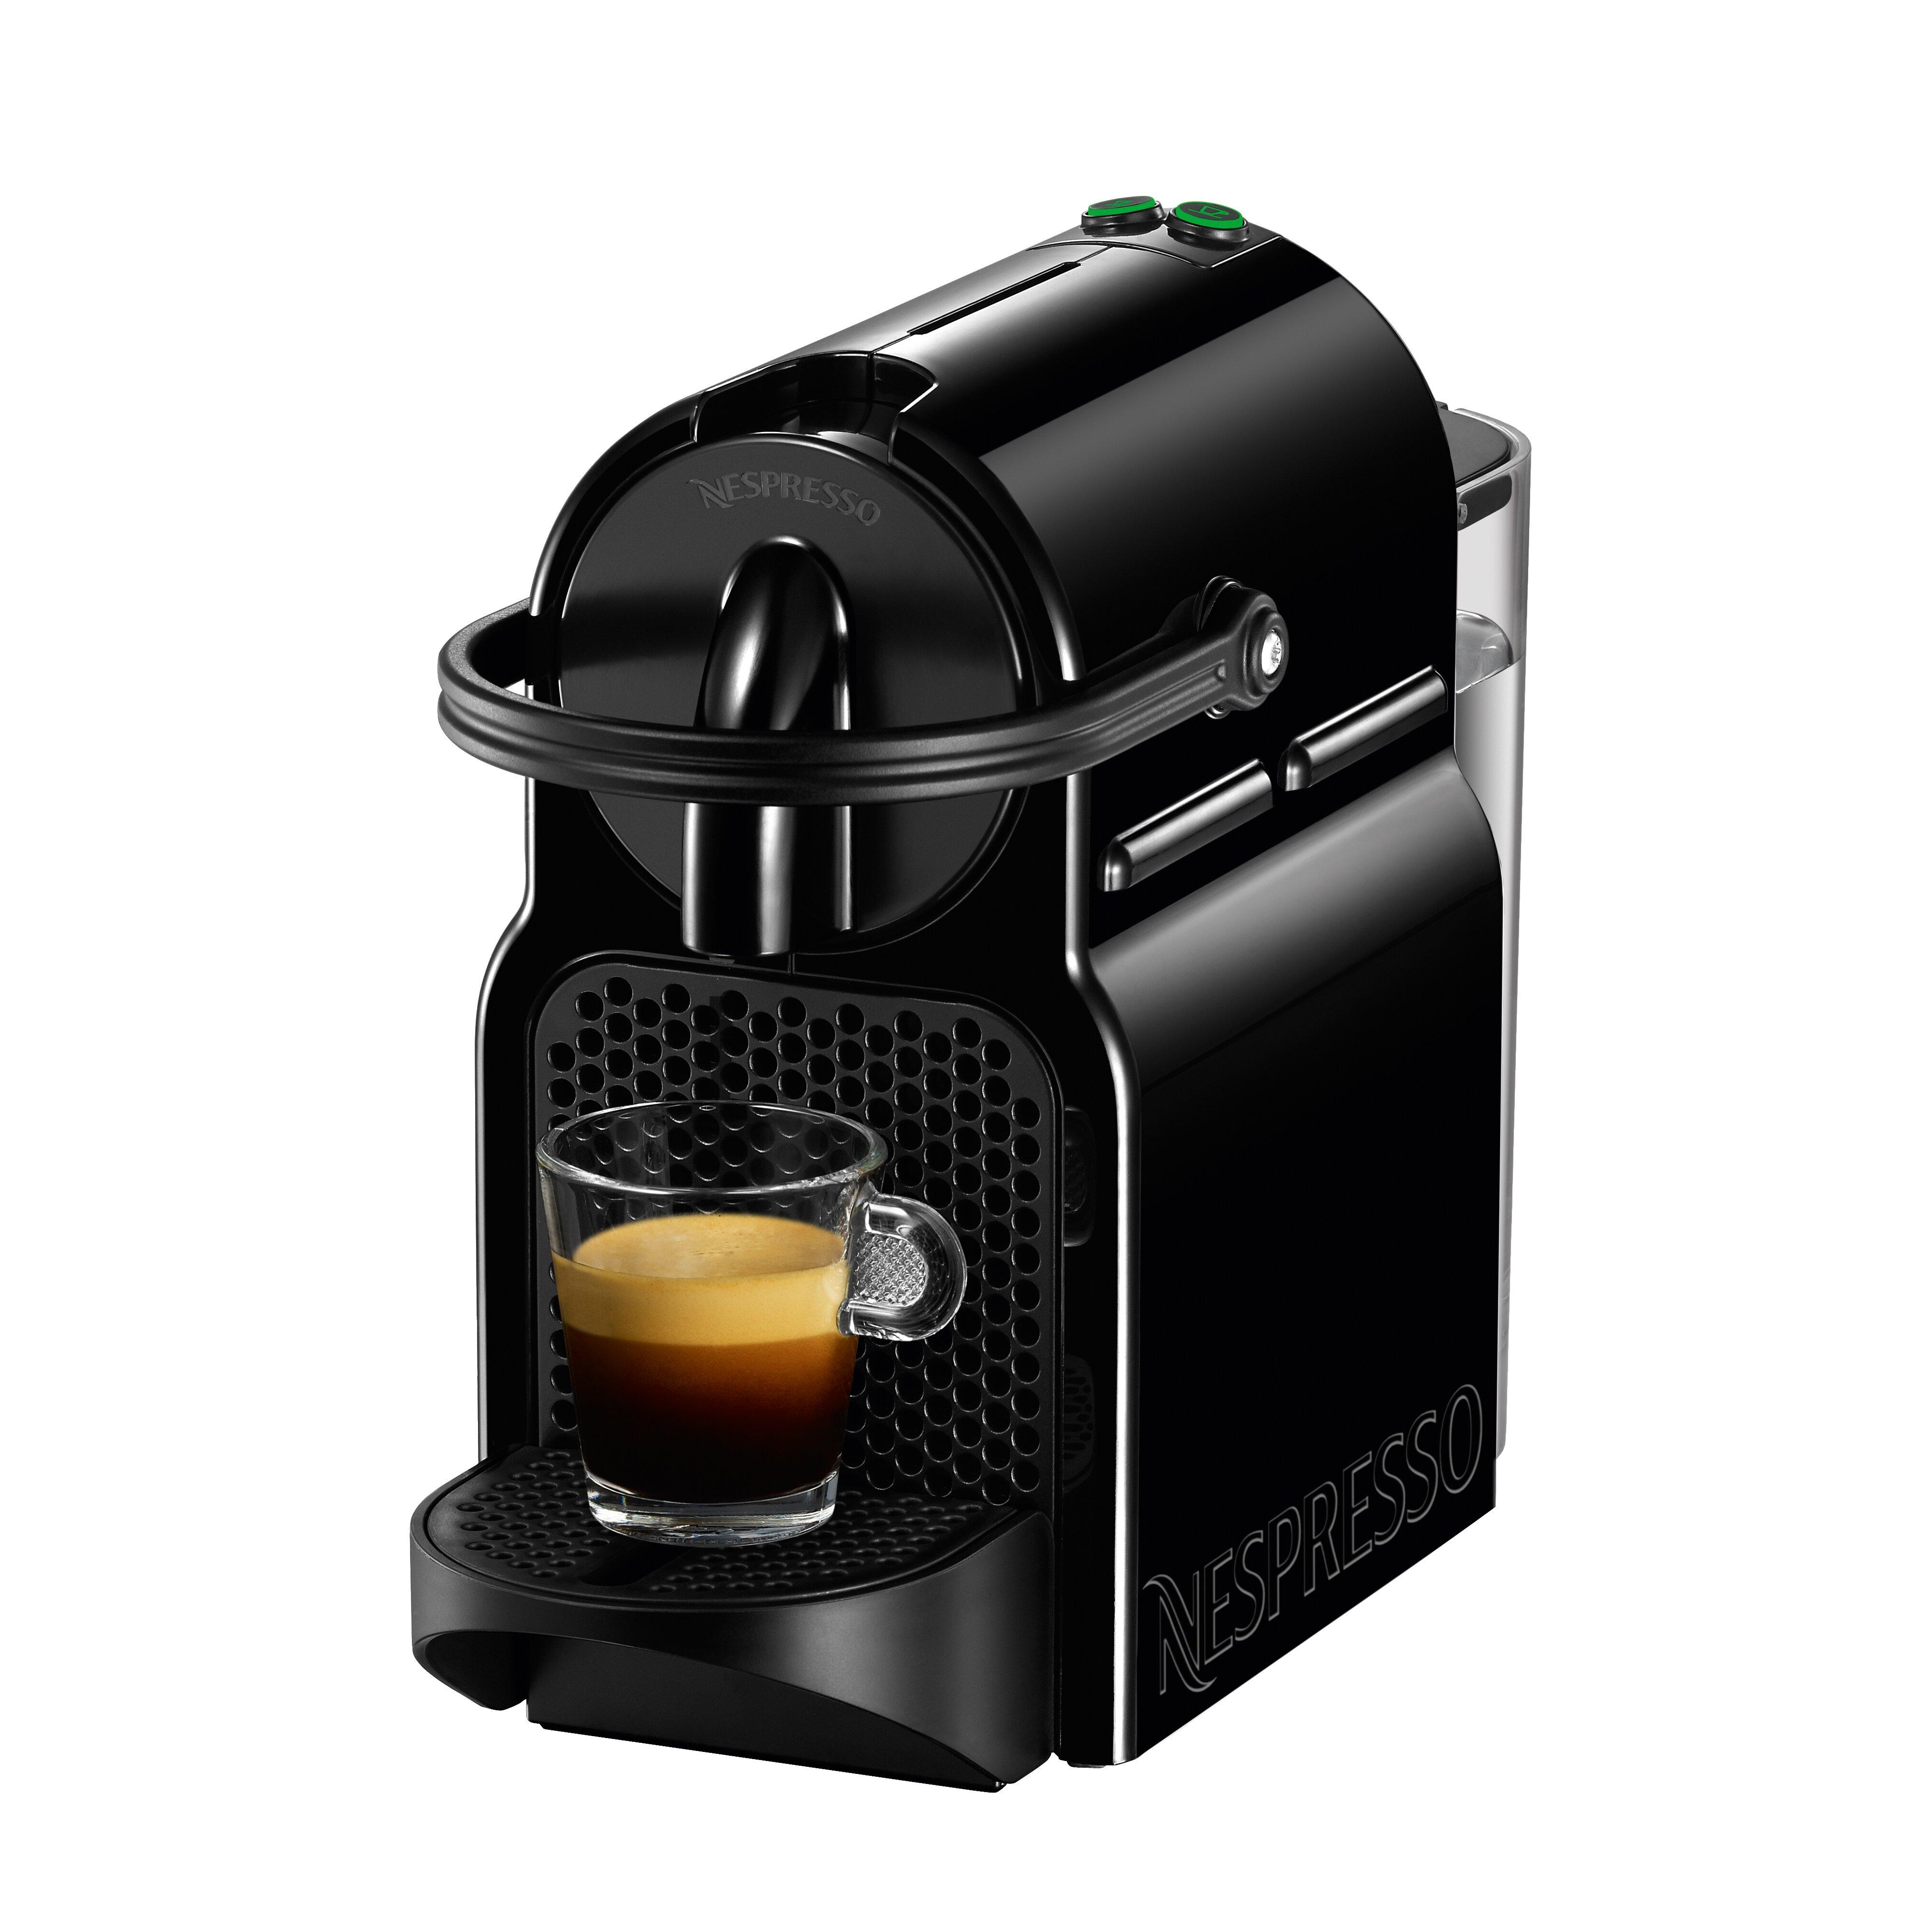 Coffee Maker With Espresso Reviews : Nespresso Inissia Espresso Maker with Aeroccino Milk Frother & Reviews Wayfair